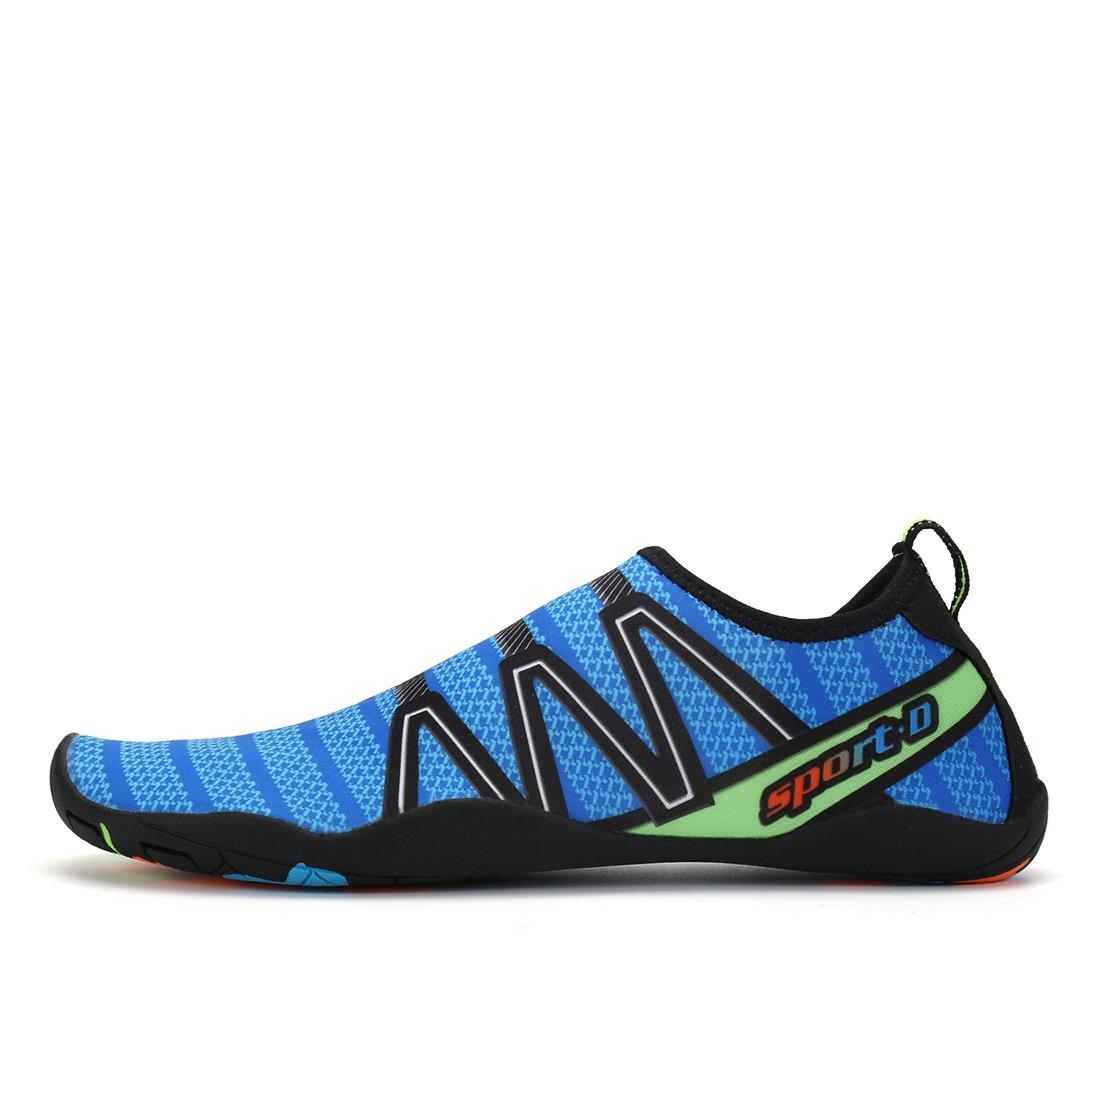 d5fff79c28bdd Zapatos de agua Kuuland Secado rápido descalzo Aqua Socks Beach Swim Pool Surf  Zapatos para nadar Buceo caminando Yoga Hombres Mujeres Azul